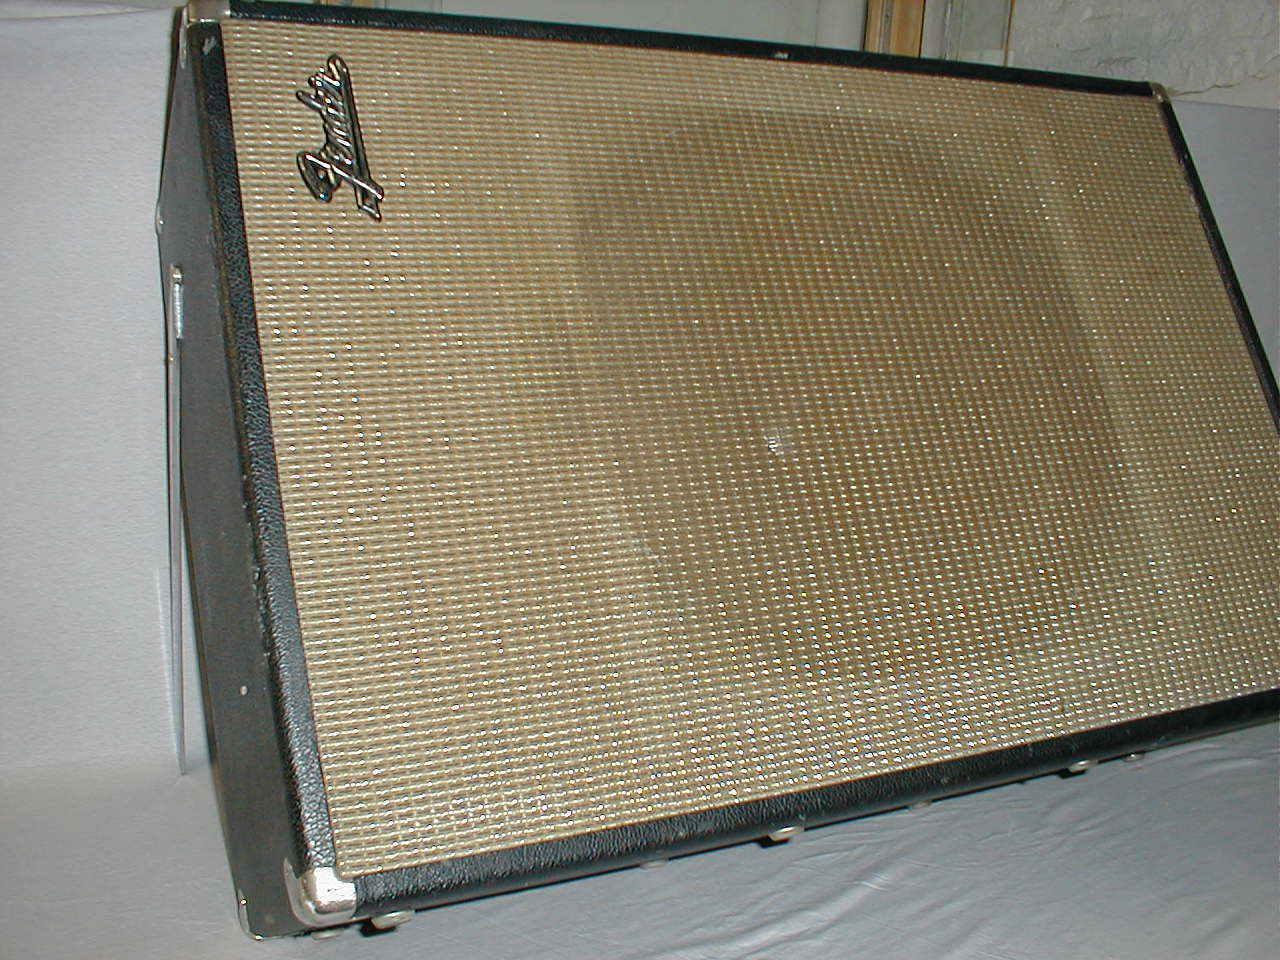 60's Fender Fender Fender Bass CAB 18  - made in USA 99e3ad